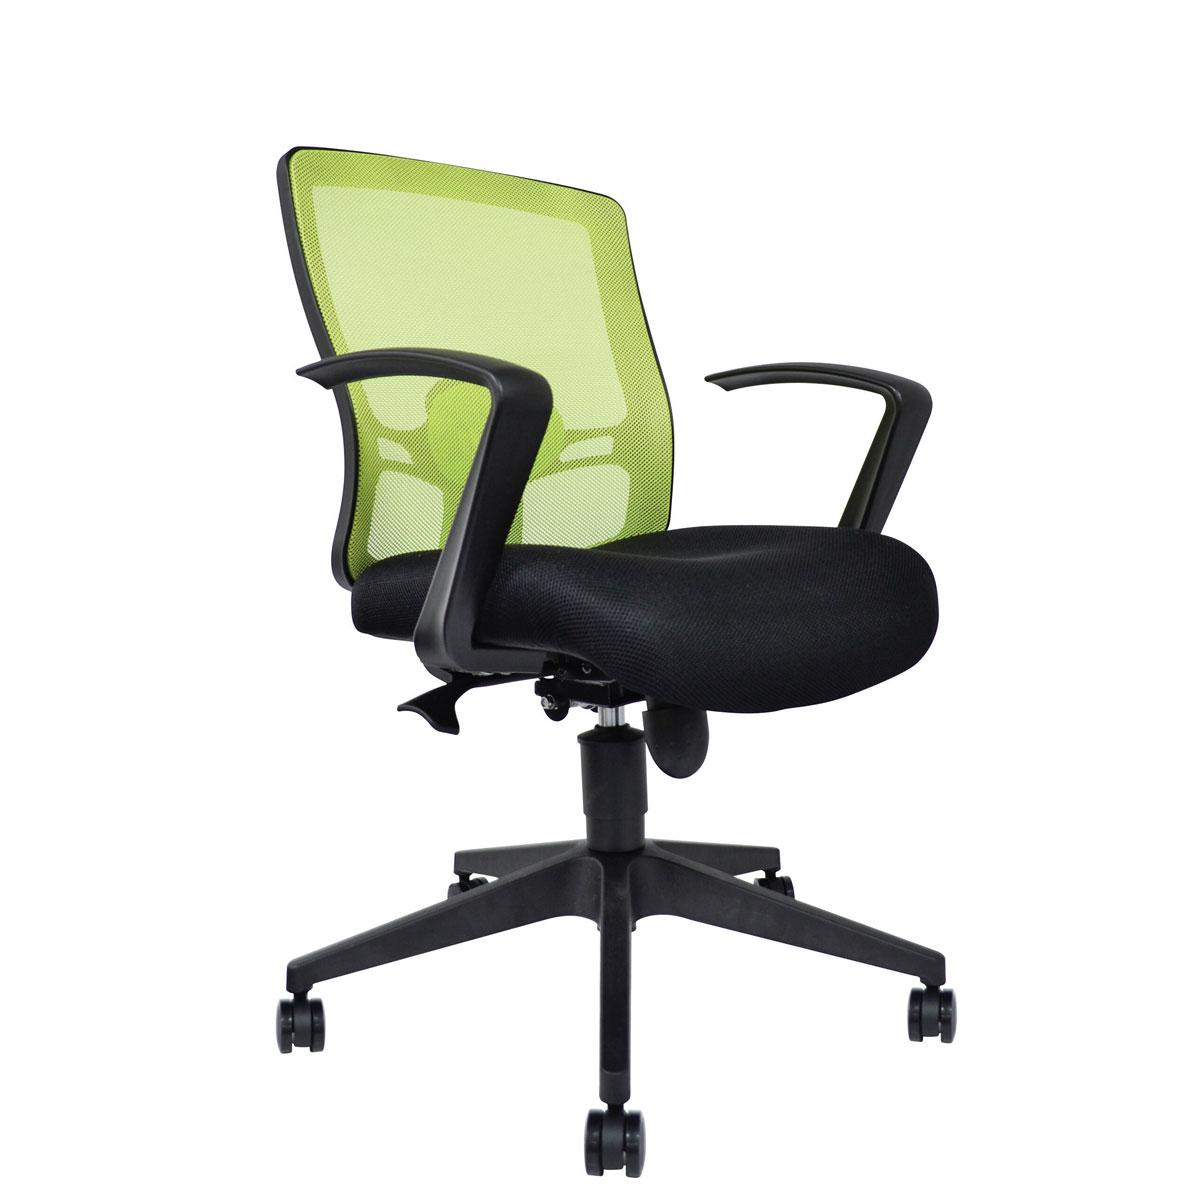 mesh low back chair nt 10. Black Bedroom Furniture Sets. Home Design Ideas